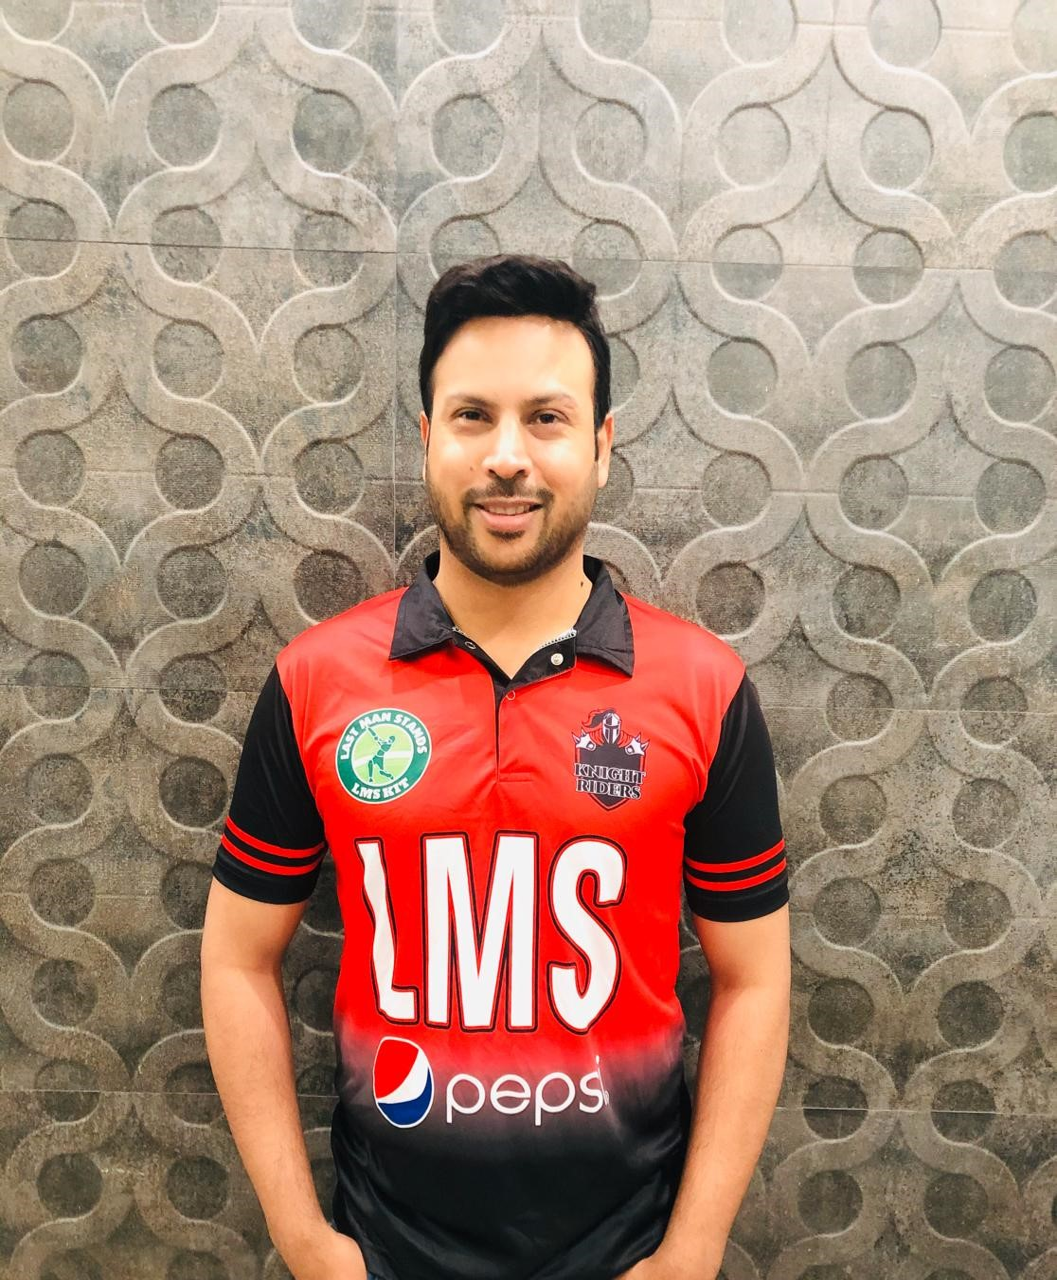 Aslam ahmed Qureshi